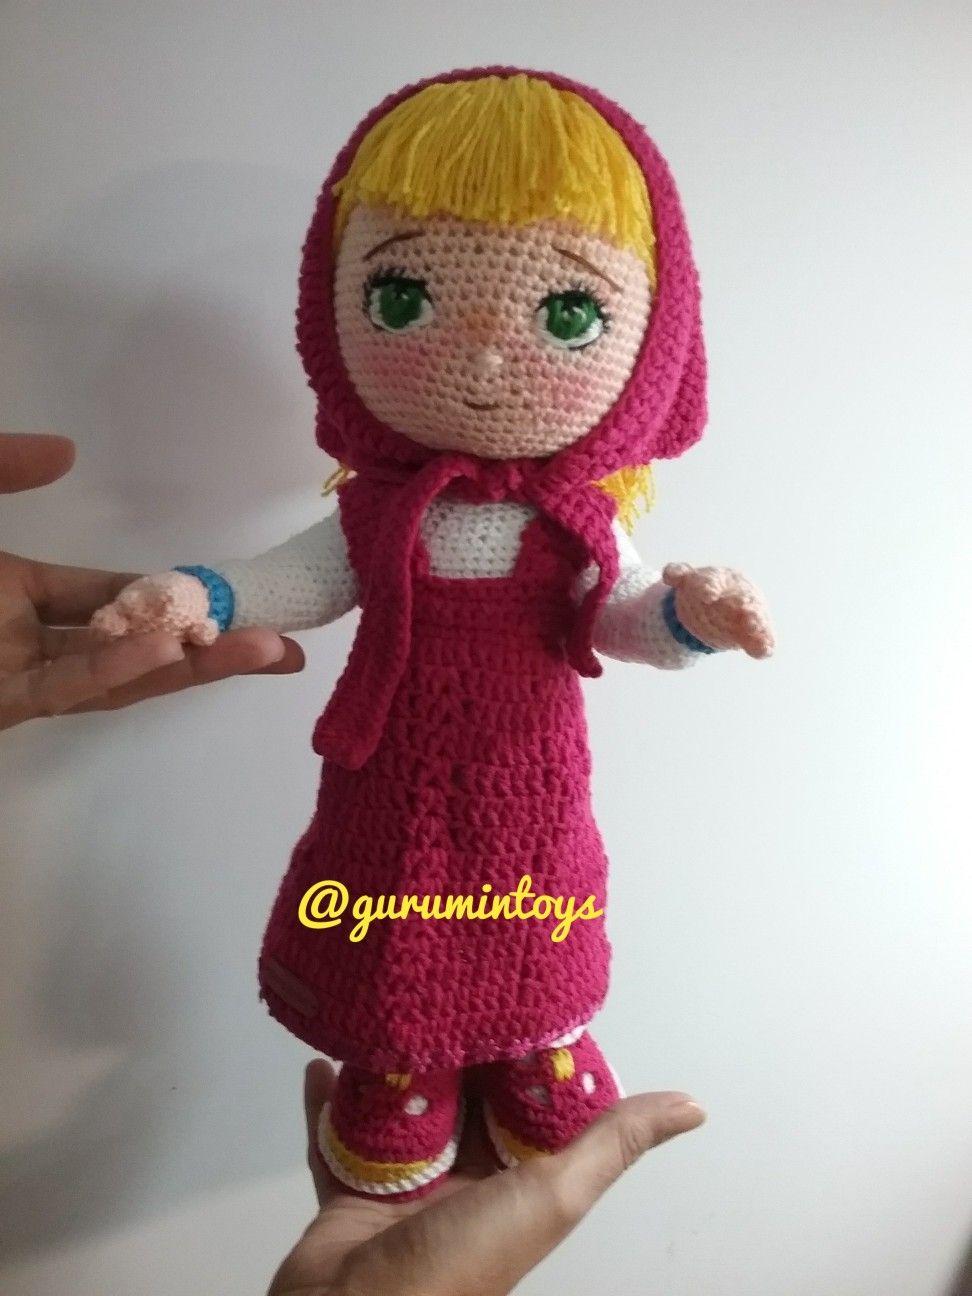 Pin de Jatsiri Marquez en muñeca crochet   Pinterest   Patrones ...